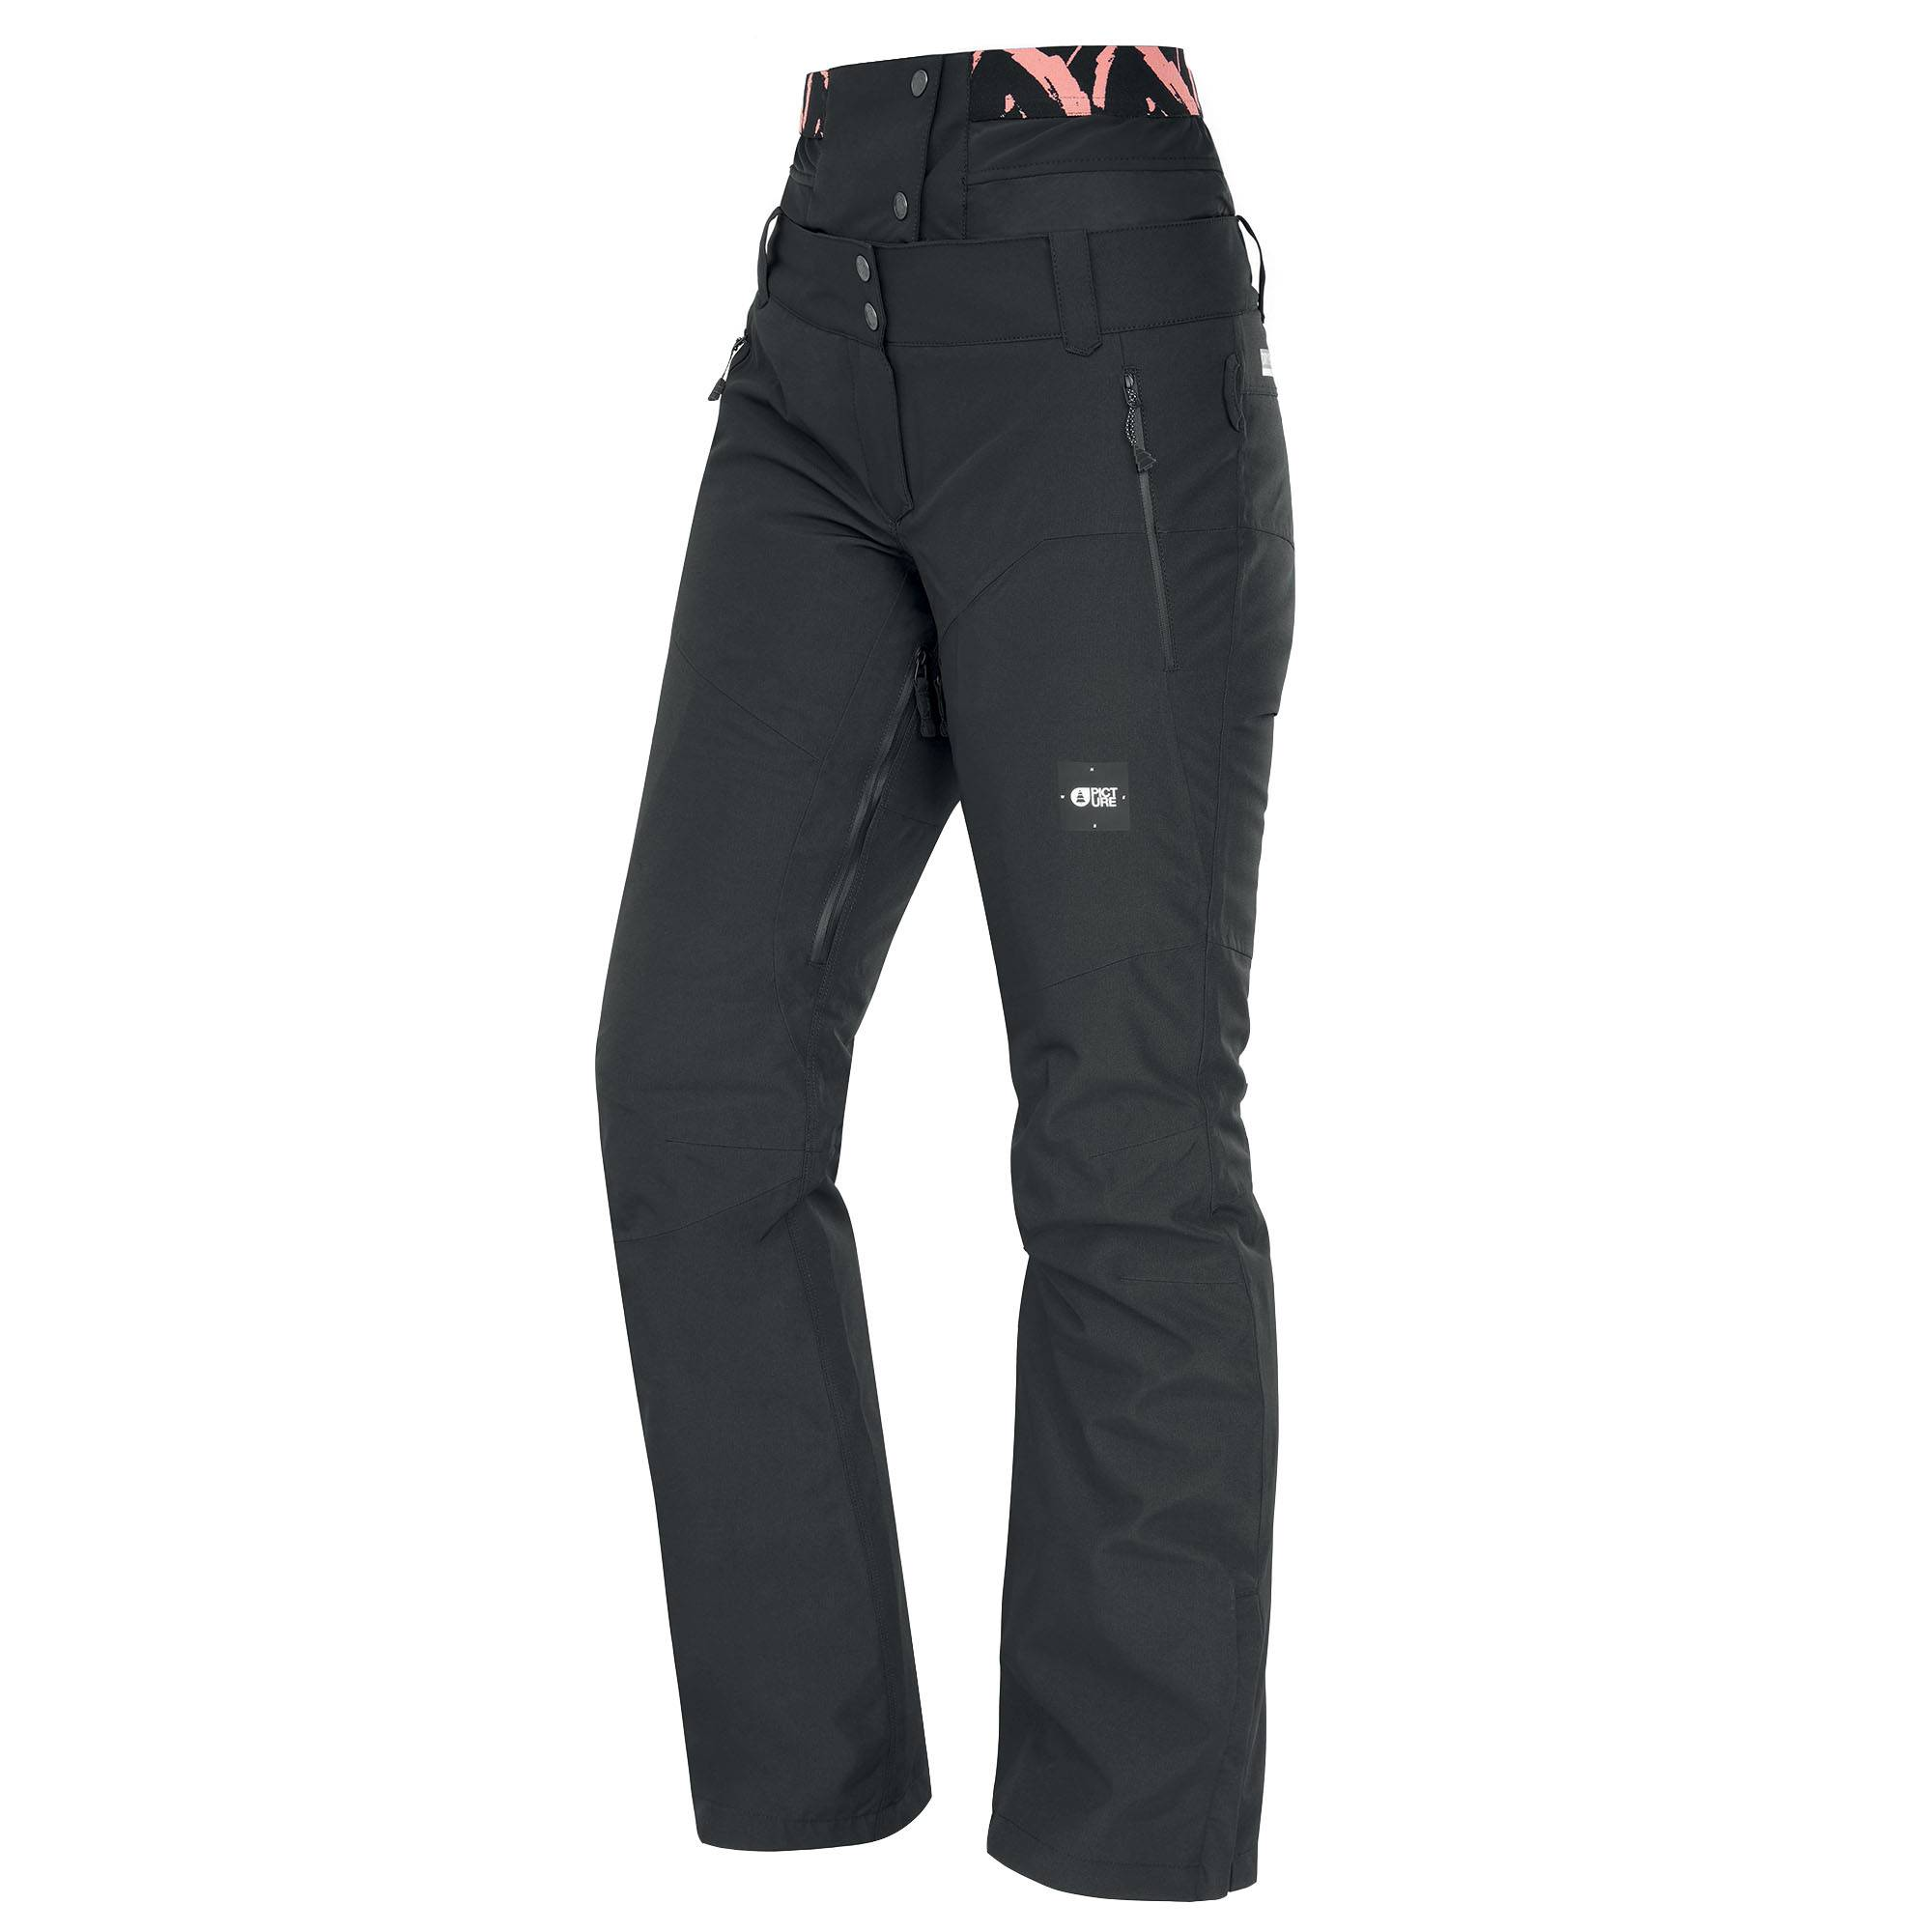 Picture Organic Clothing Women's Exa Snow Pants  - Misty Pink - Size: Medium